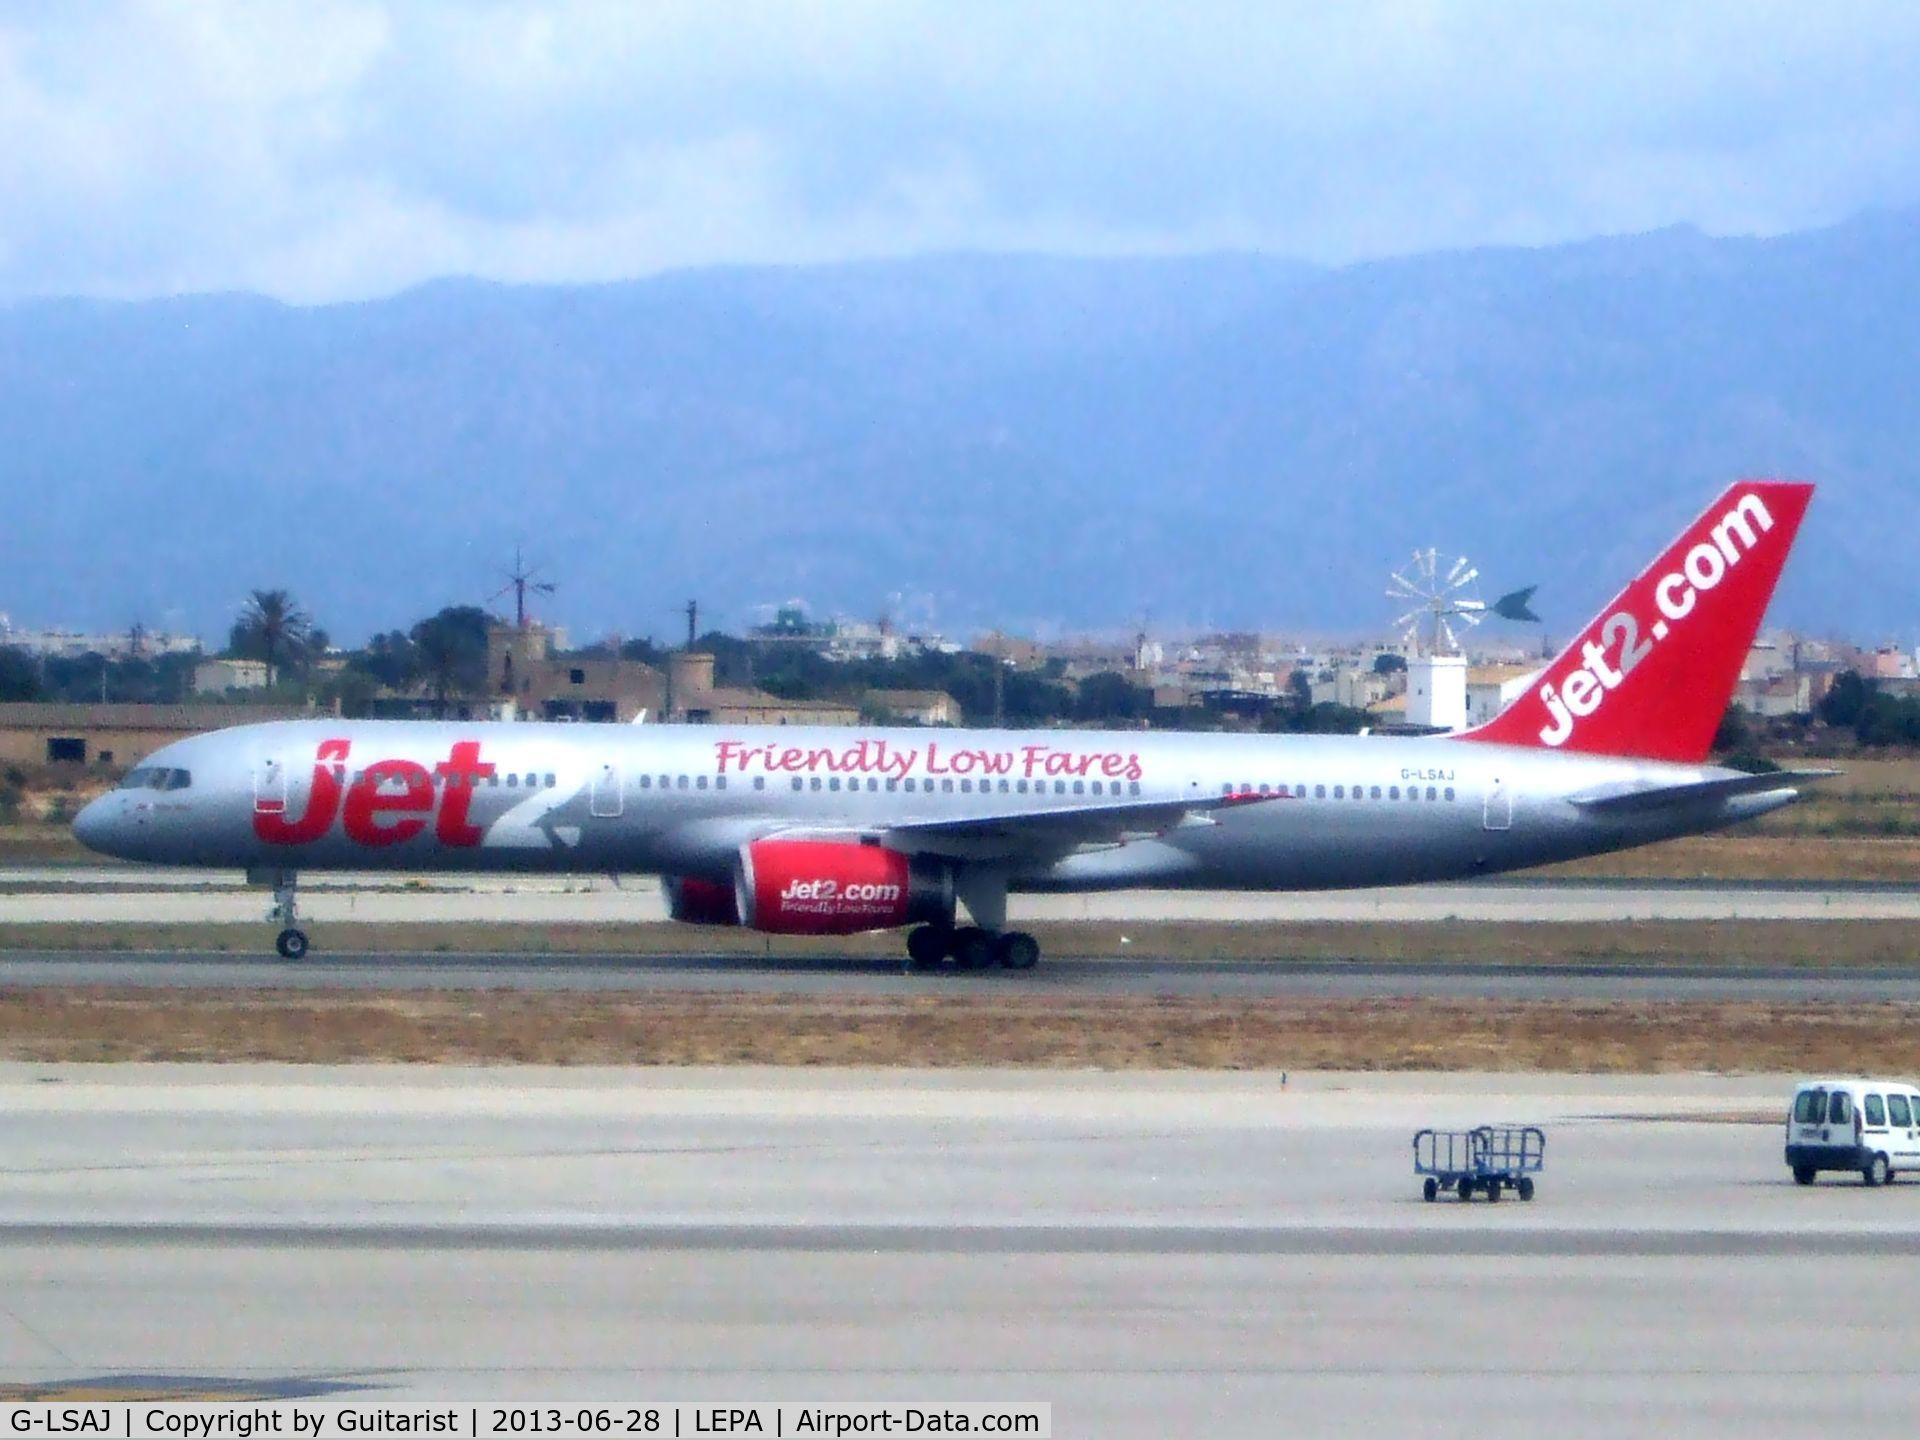 G-LSAJ, 1990 Boeing 757-236 C/N 24793, Just landed on 06L